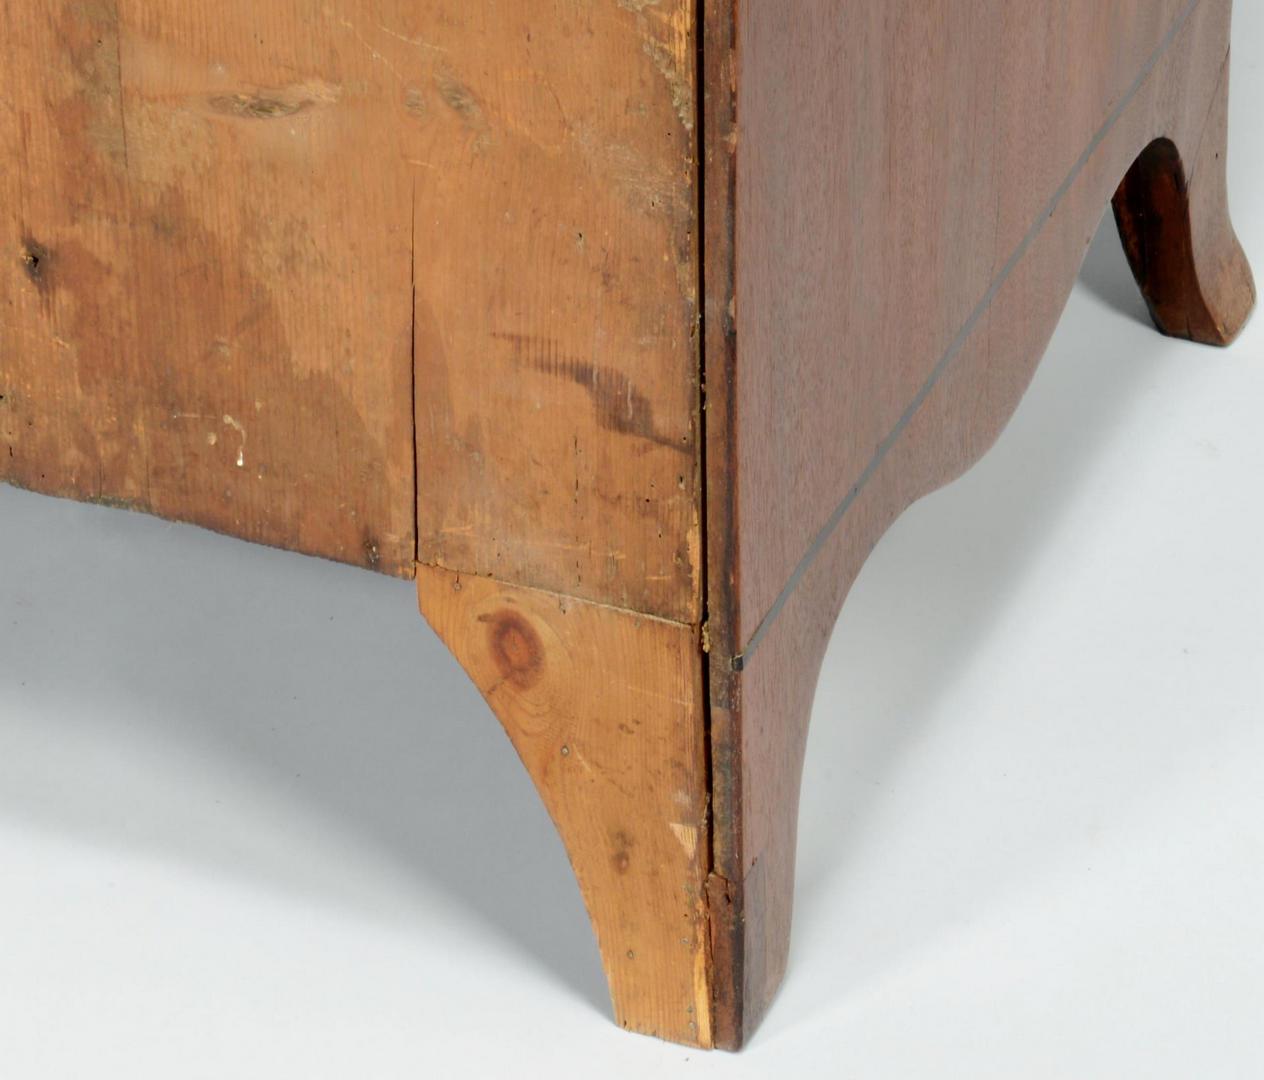 Lot 149: English Hepplewhite Chest of Drawers